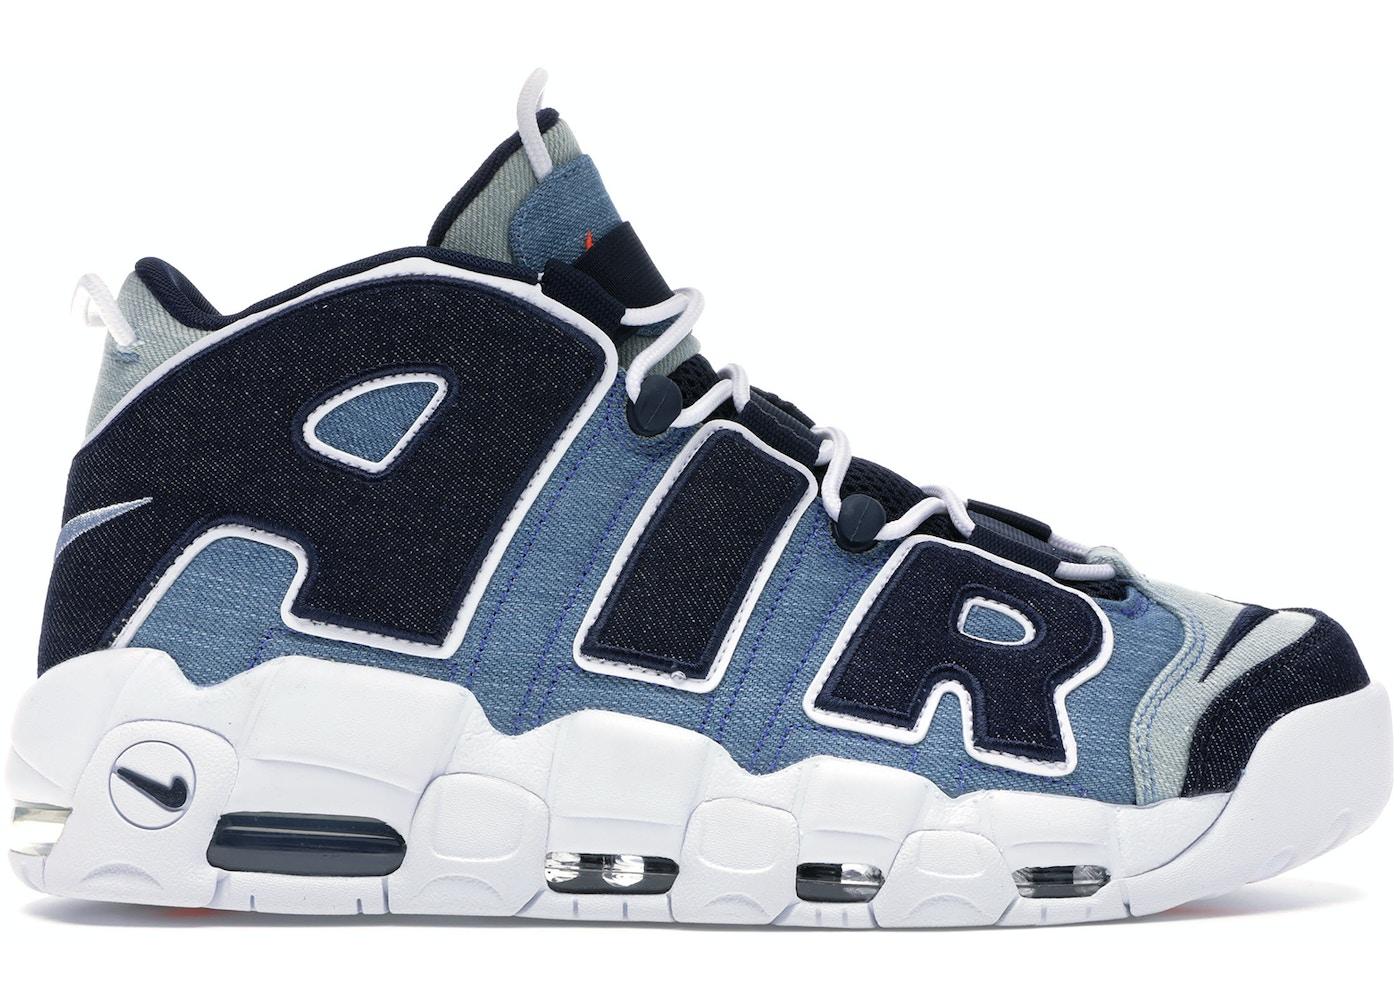 Cuerda exprimir Haciendo  Nike Air More Uptempo 96 Denim - CJ6125-100